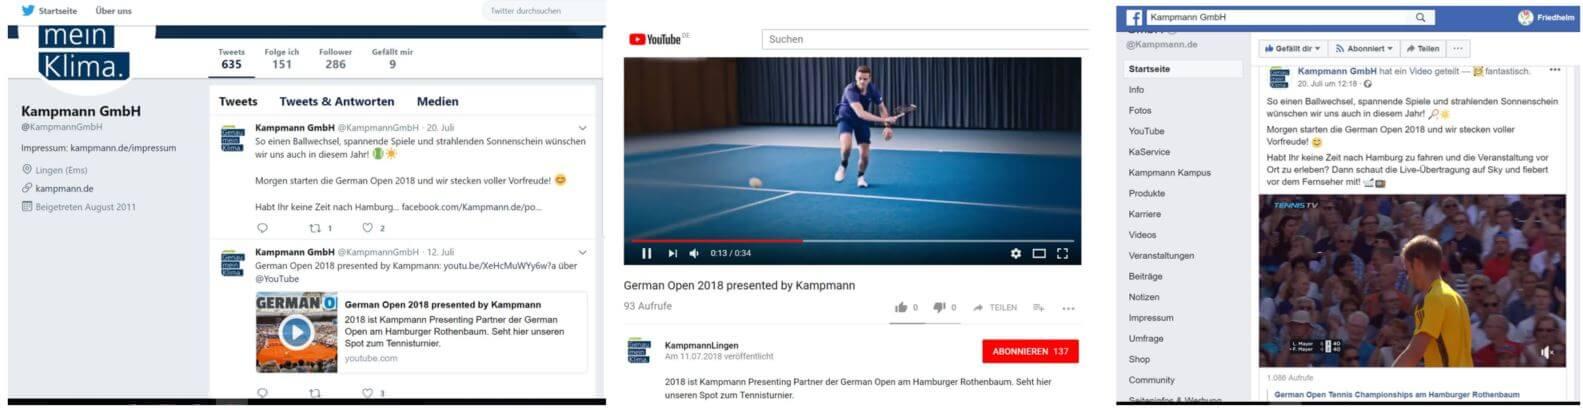 Social Media-Kanäle von Presentership-Sponsor Kampmann